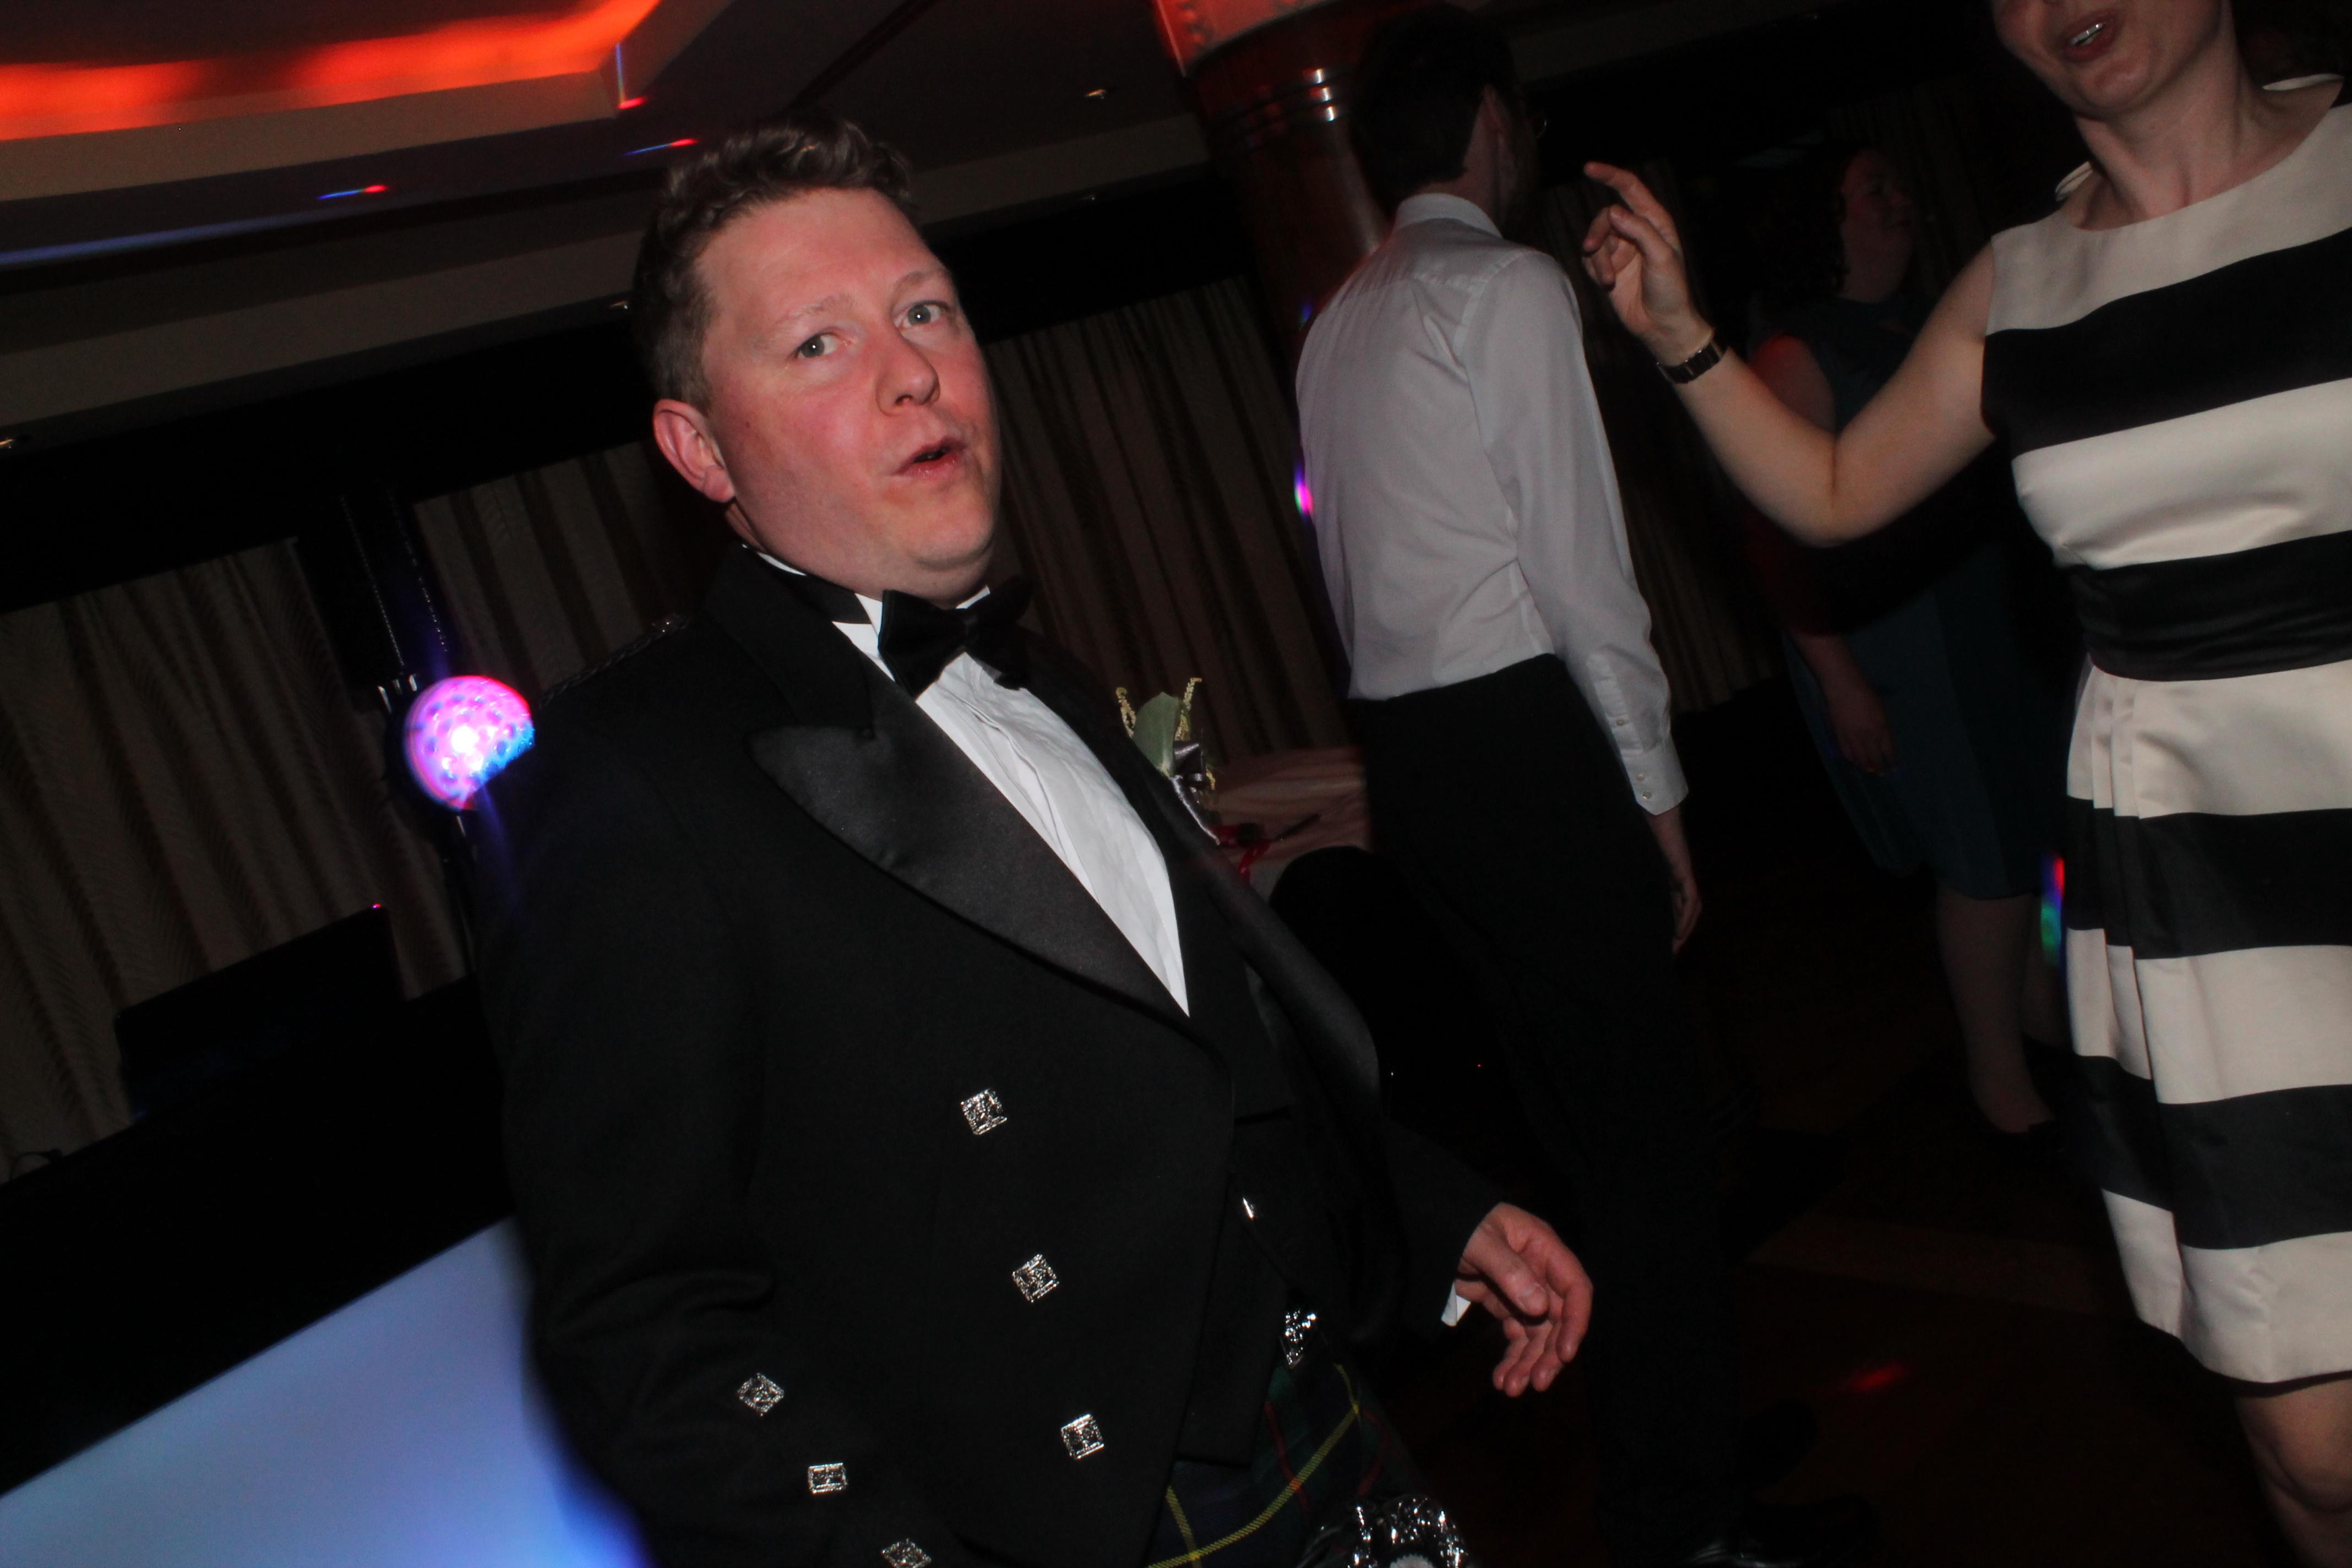 Renfrewshire wedding DJ